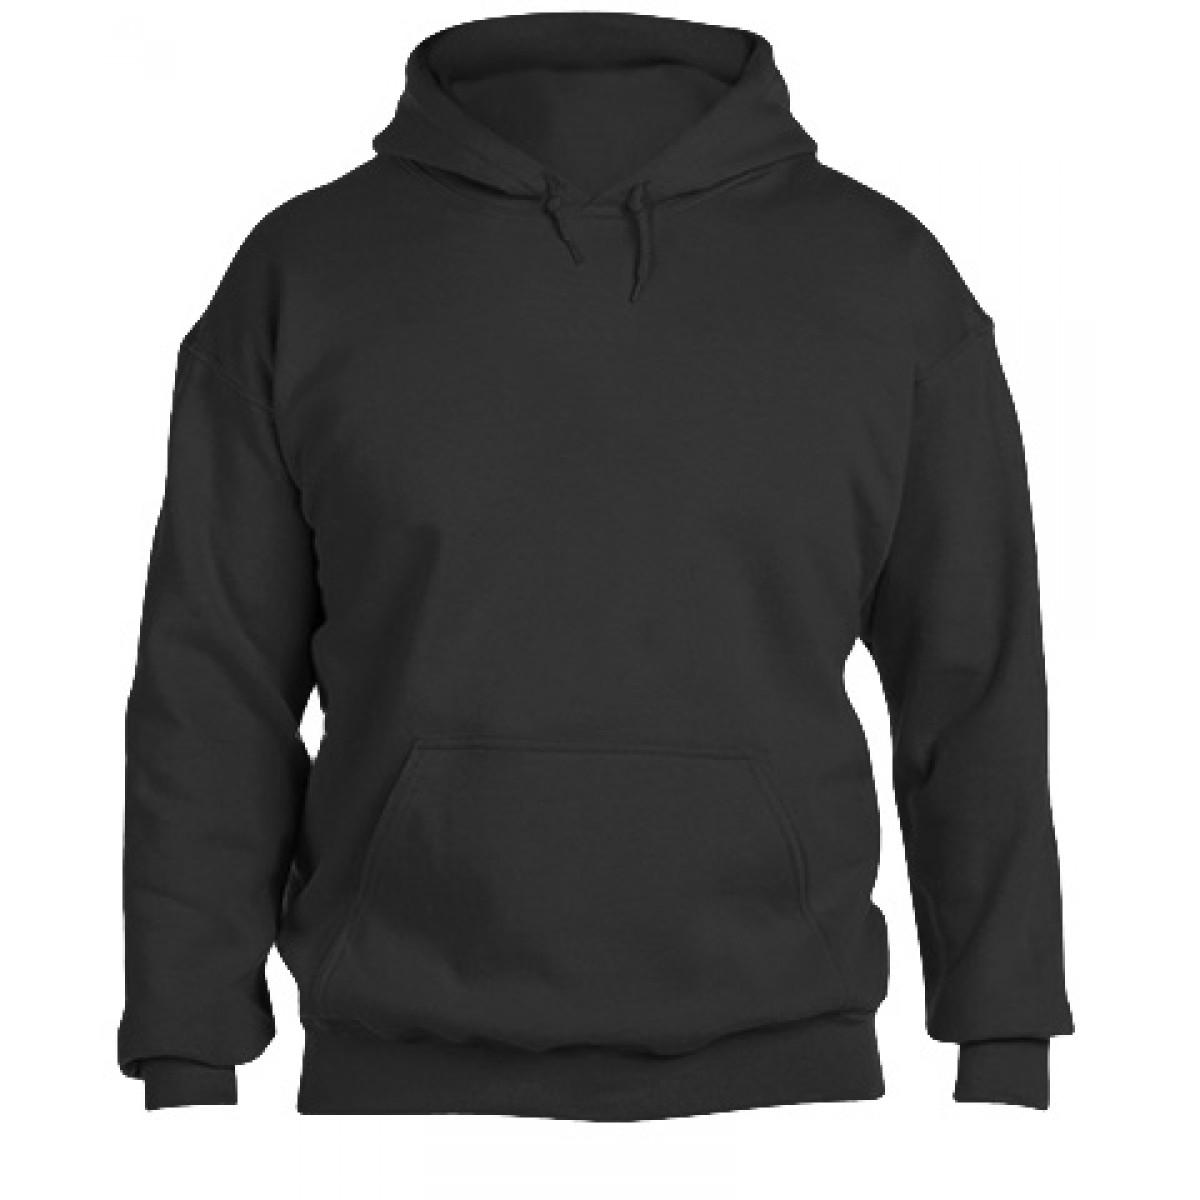 Hooded Sweatshirt 50/50 Heavy Blend -Black-2XL